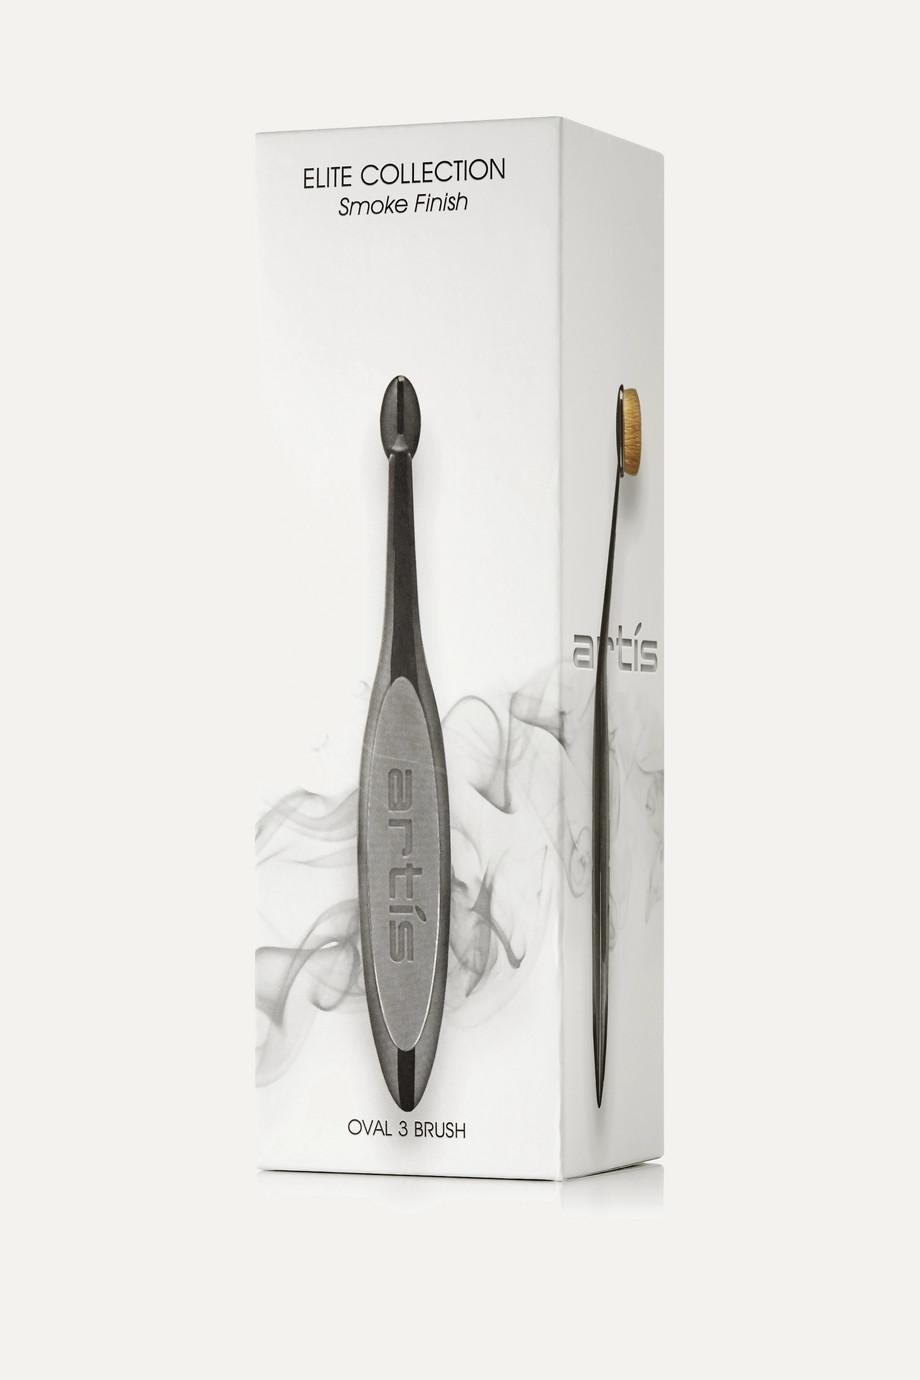 Artis Brush Next Generation Elite Smoke Oval 3 Brush